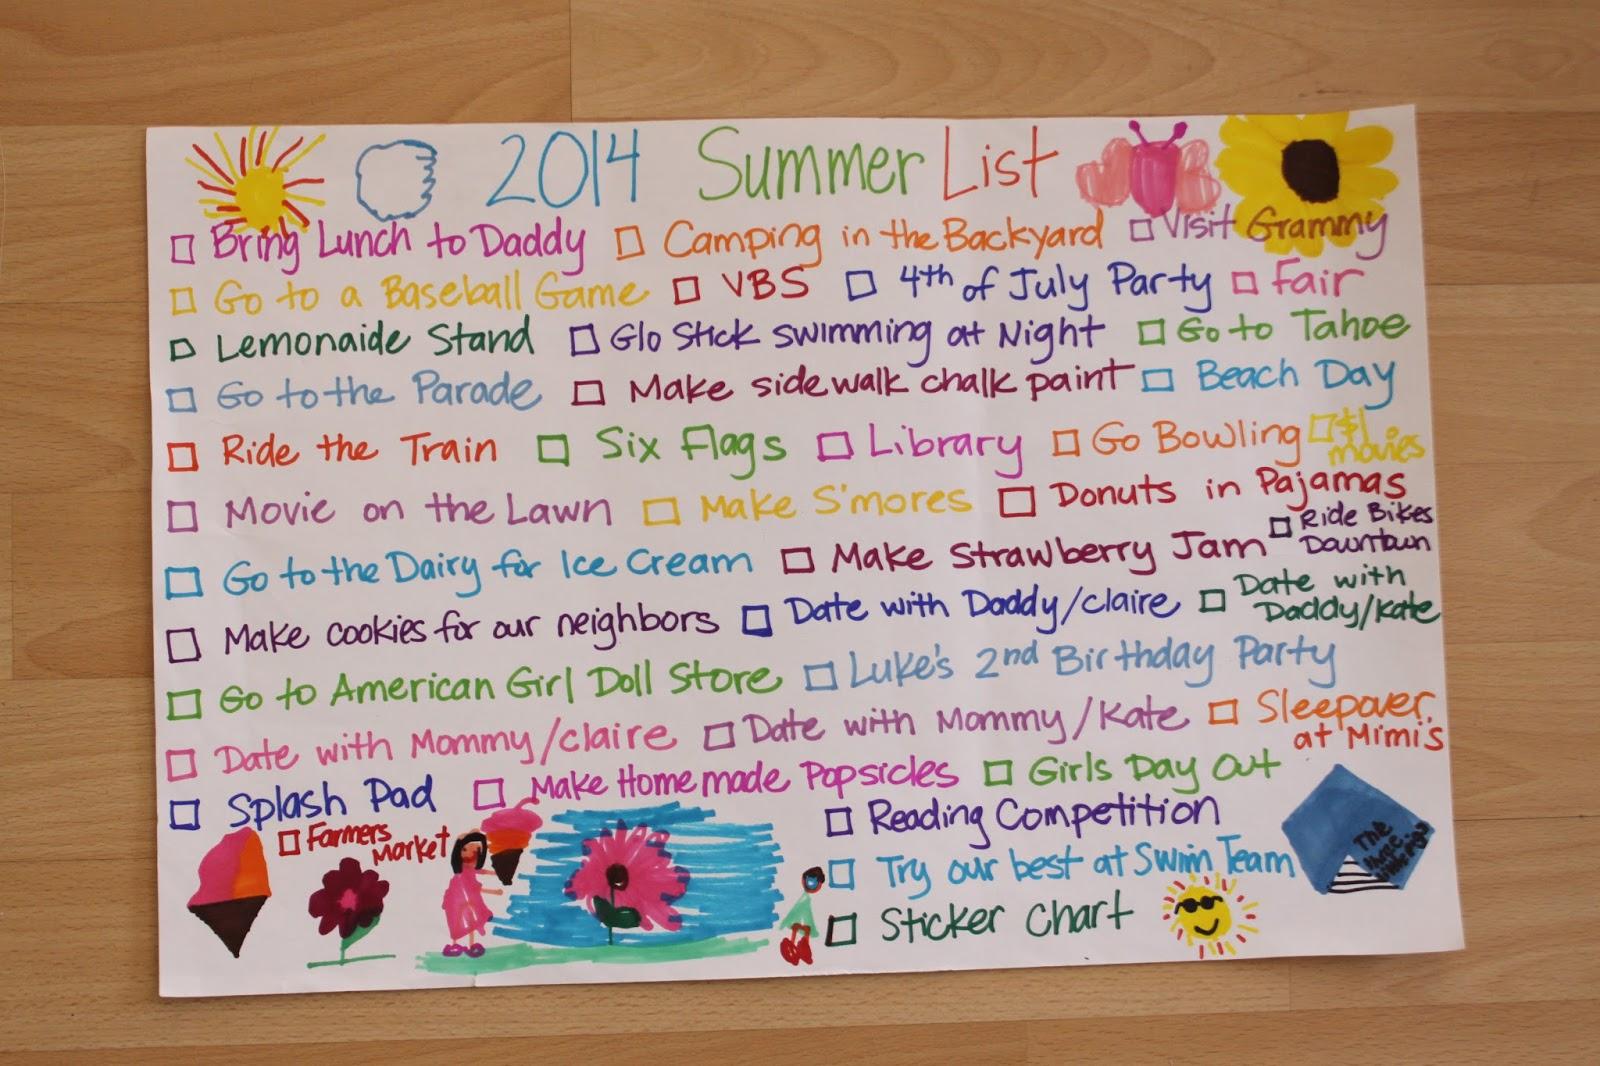 The Larson Lingo Our 2014 Summer List